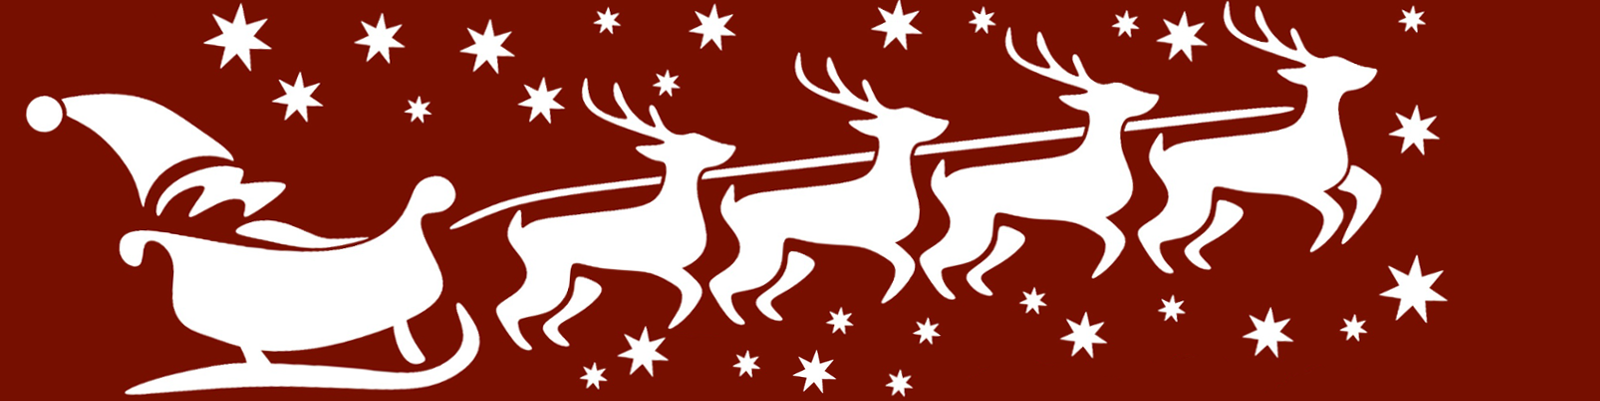 slide:Santa Land